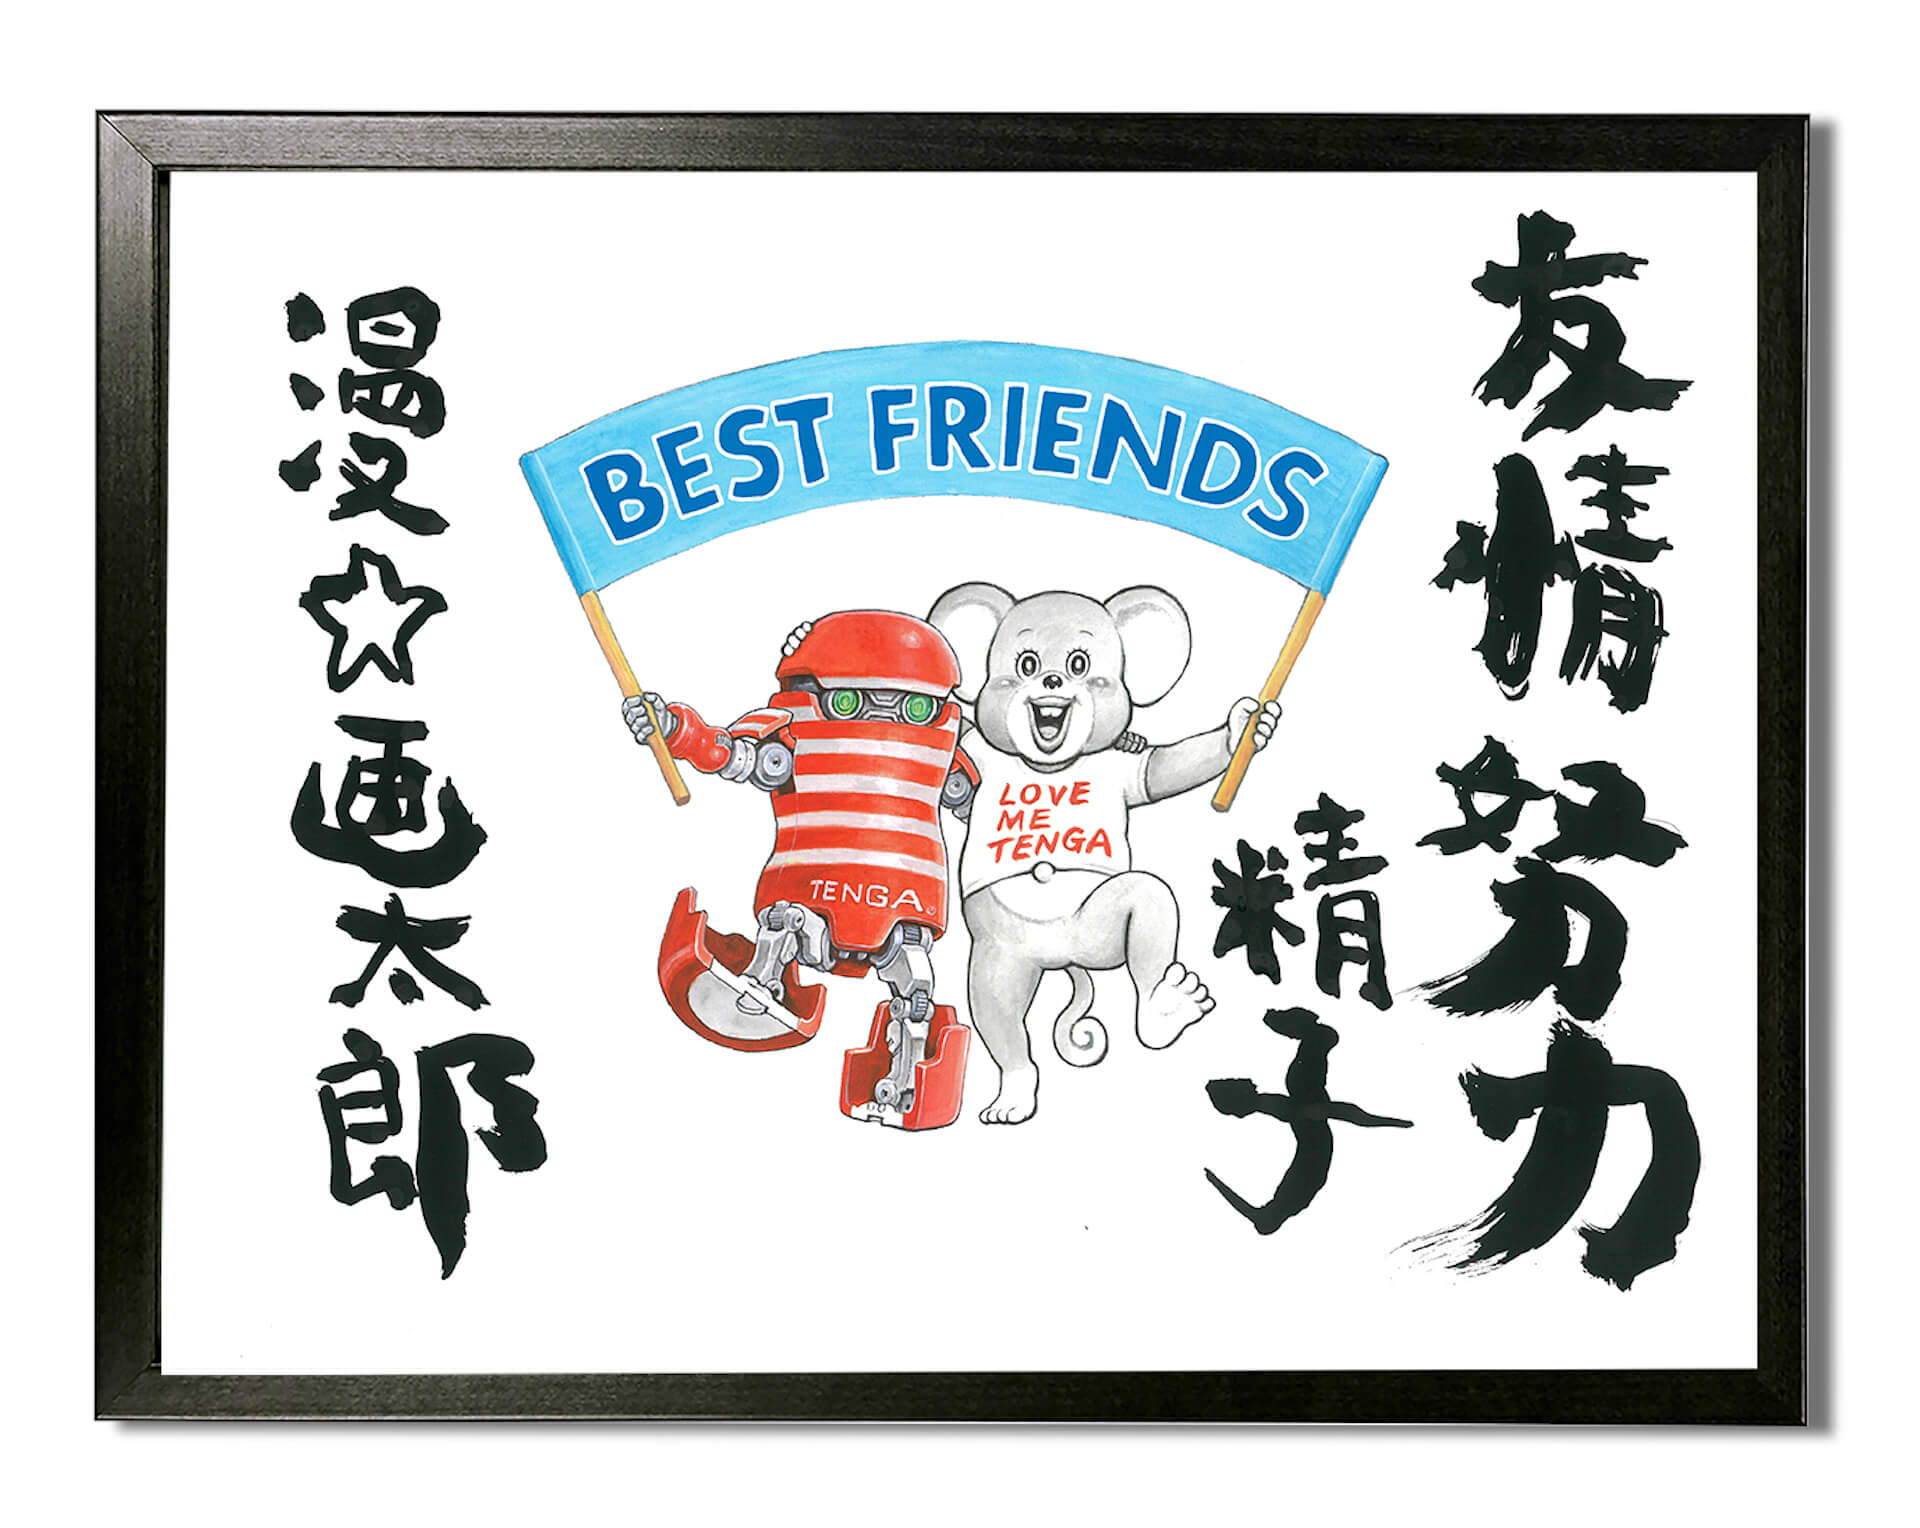 友情、努力、〇〇!TENGA×漫☆画太郎の作品展「TEN☆画太郎展」が開催 music190919-tengataro-1